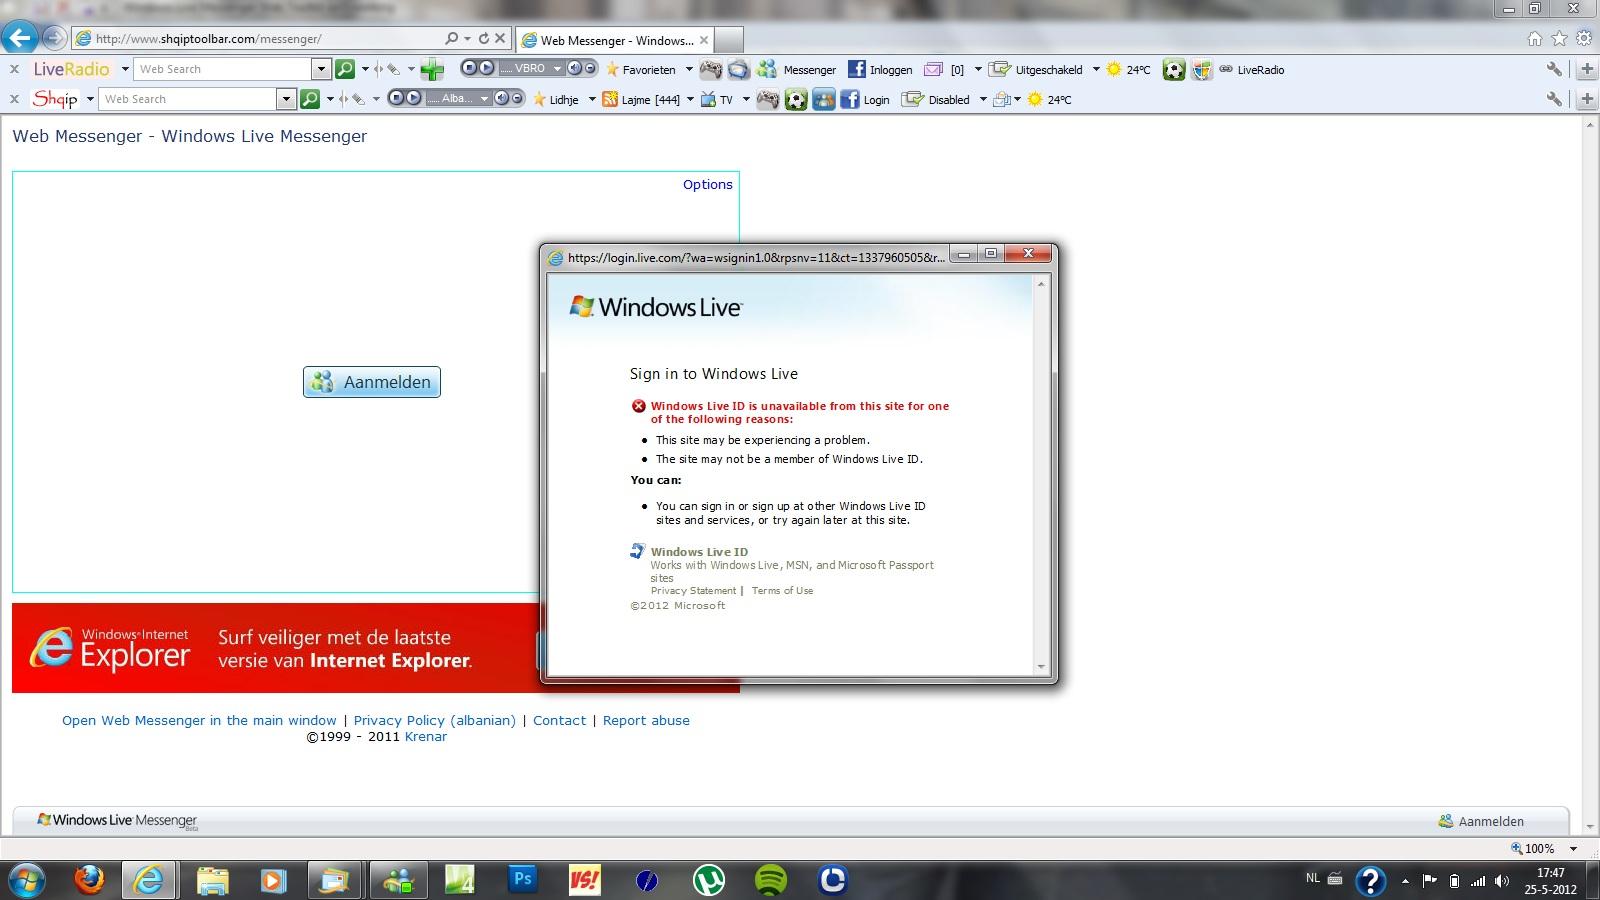 Windows Live Messenger Sign In